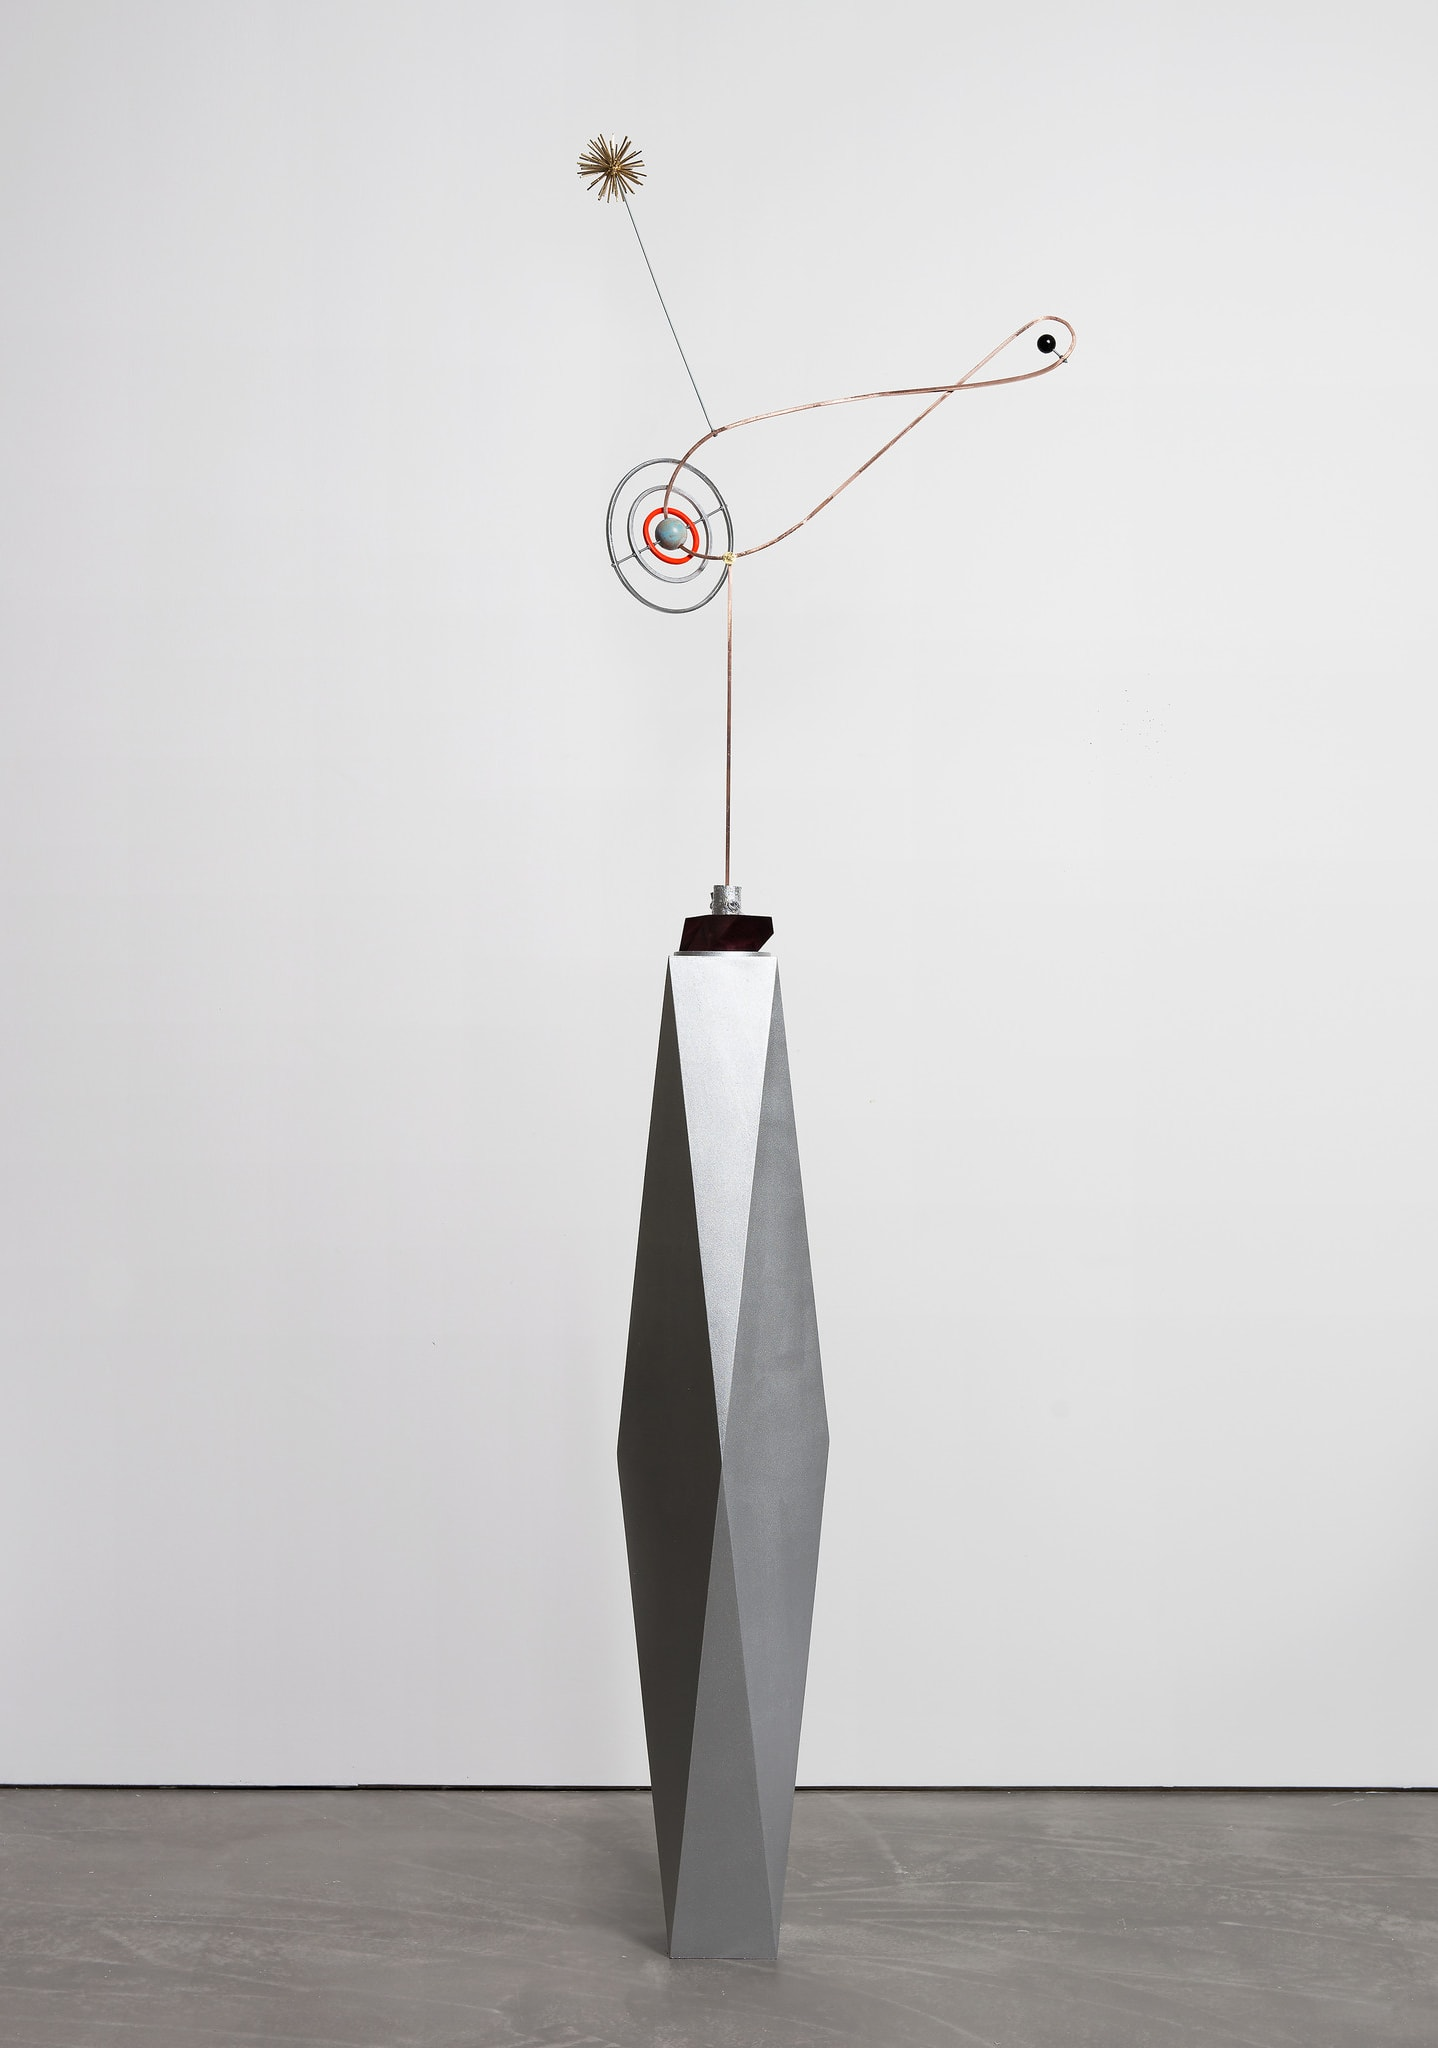 Lunar Orbit (Apollo) by Björn Dahlem